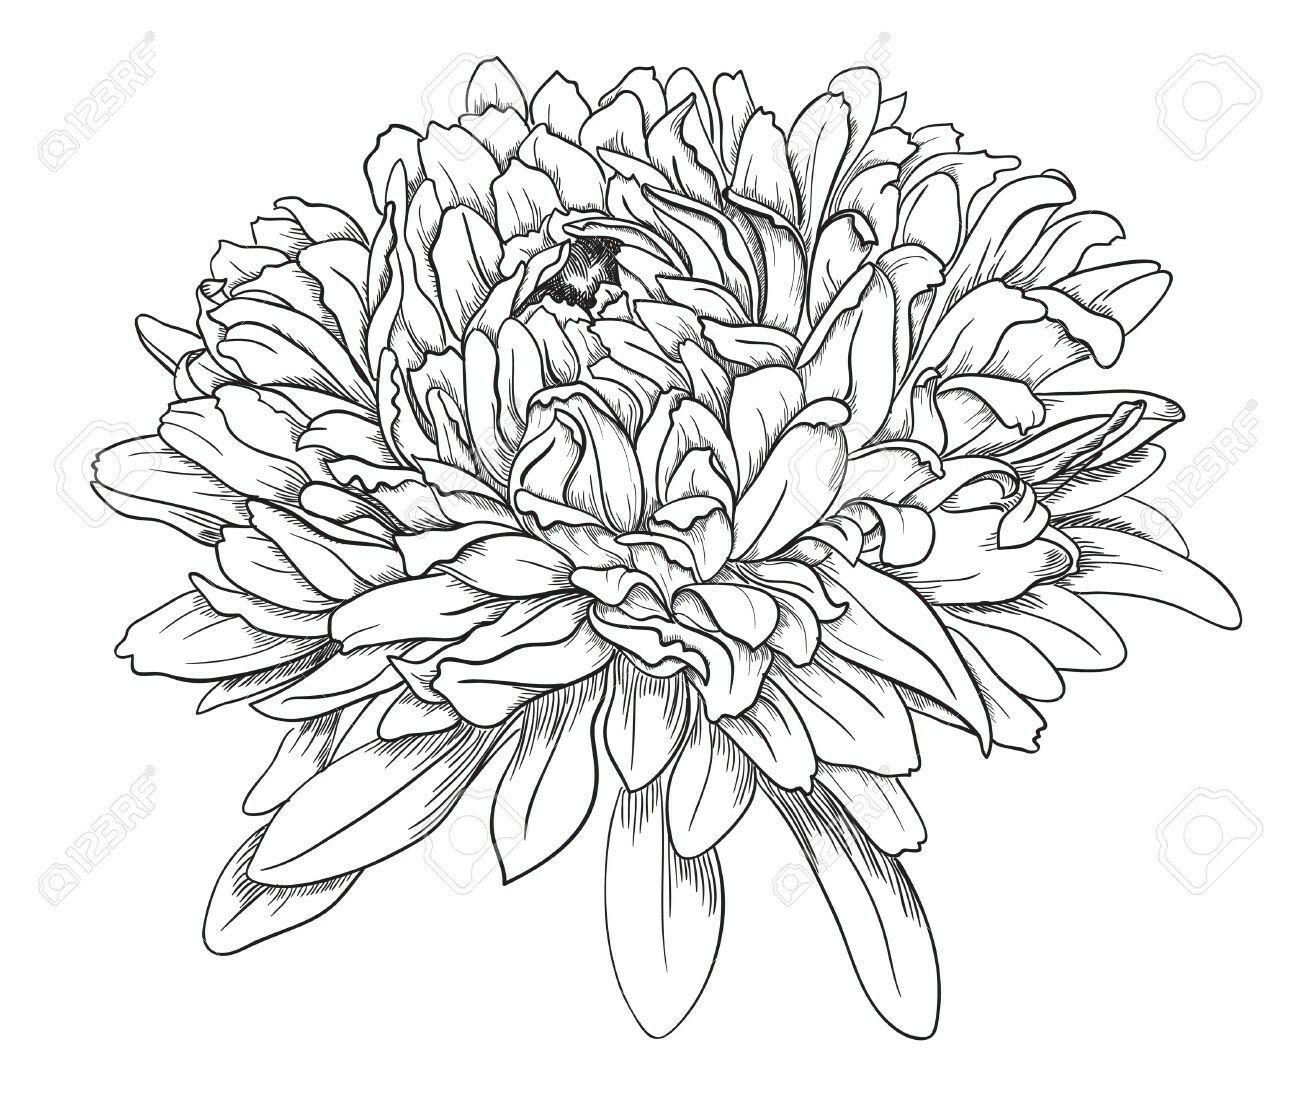 Aster September stencils Drawings Tattoos Chrysanthemum tattoo